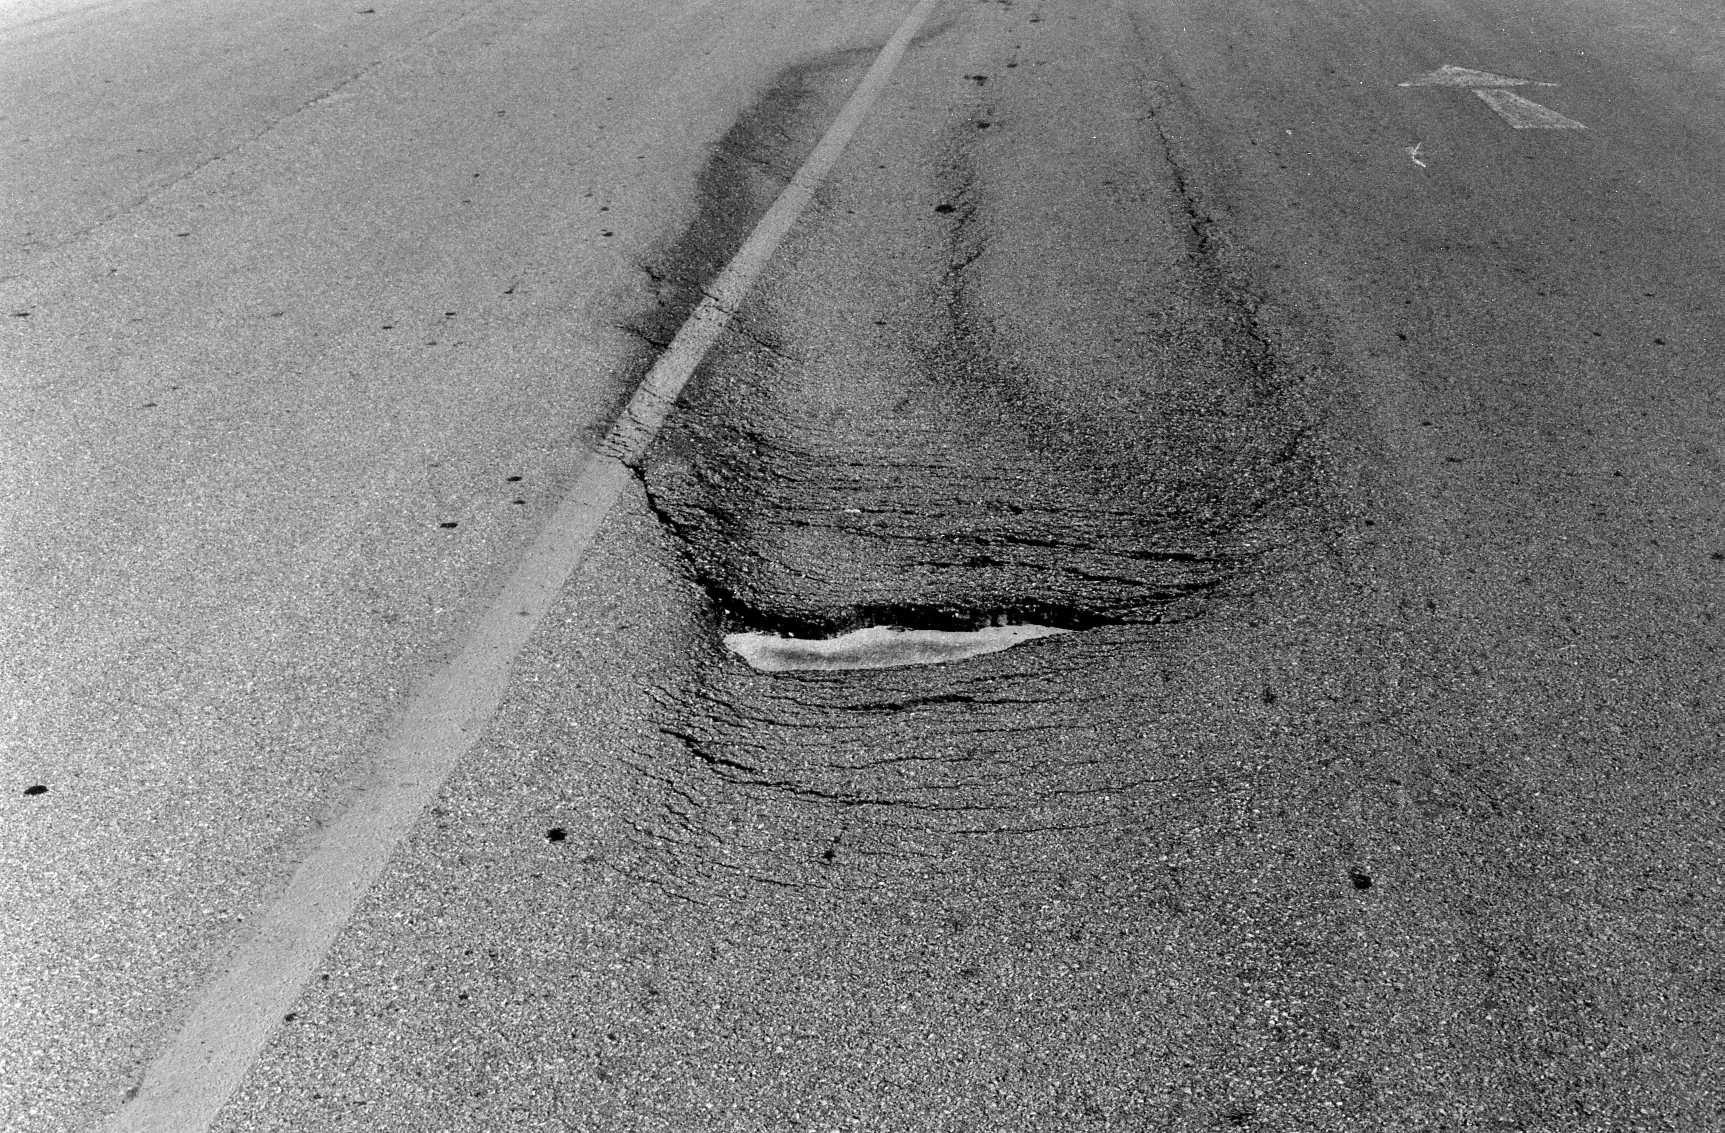 Slippage Cracking Image Cracks Amp Joints Repair Indiana